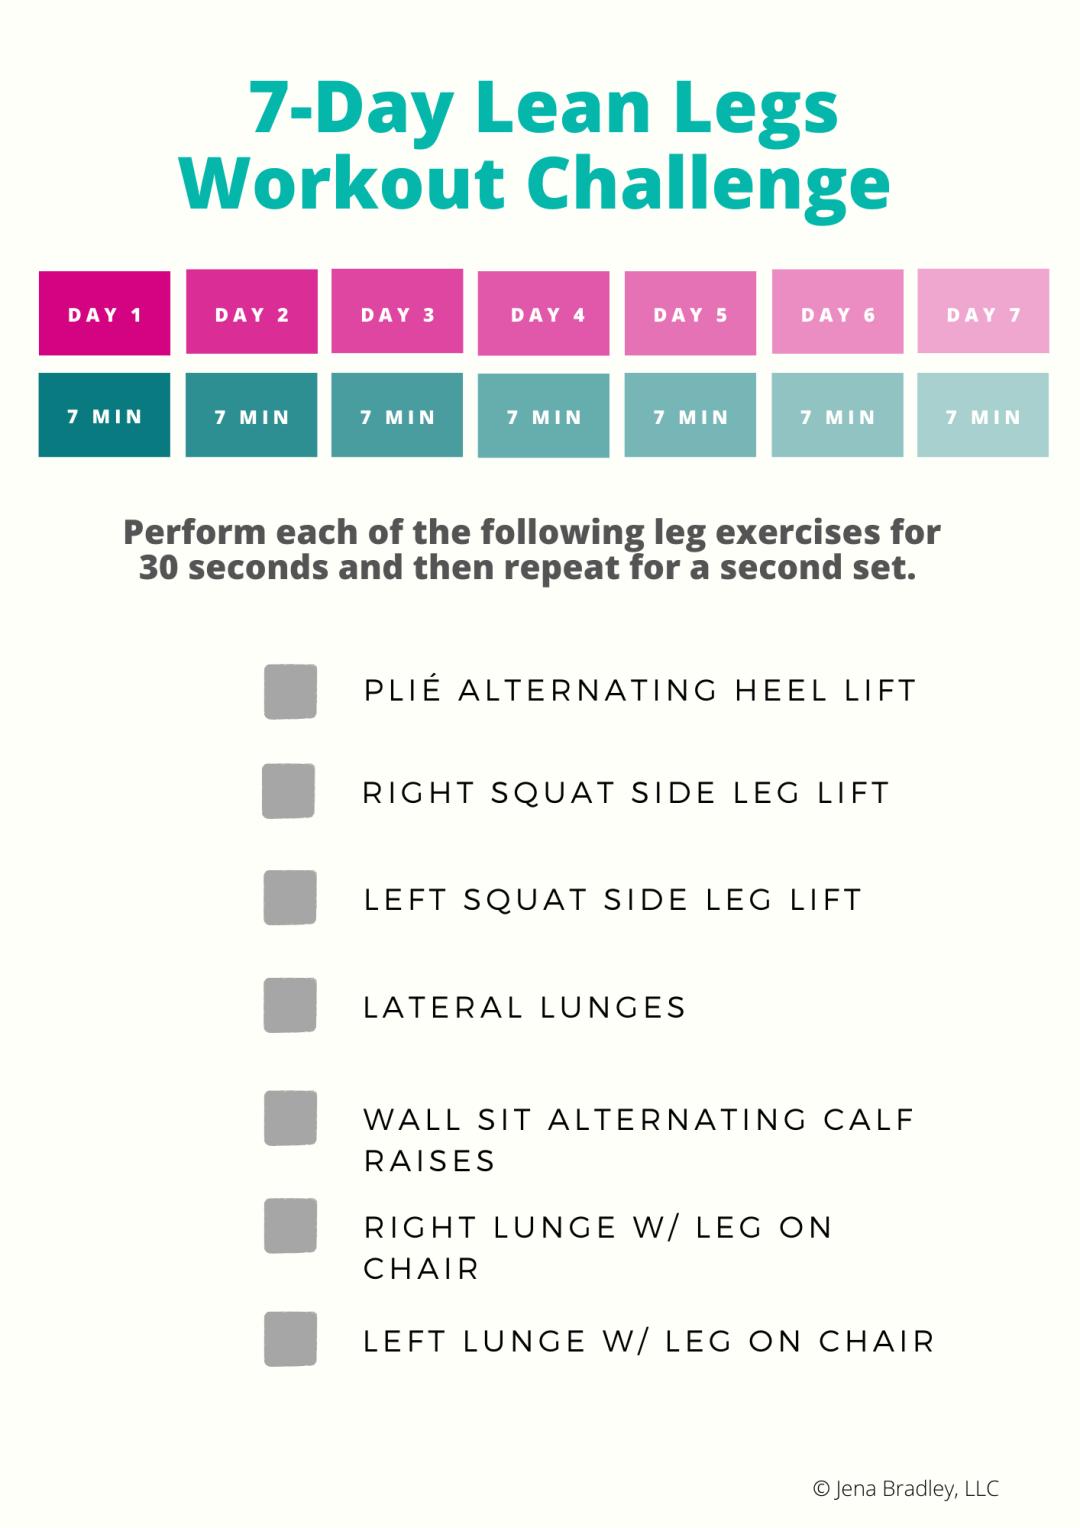 7-Day Lean Legs Challenge-7 Minute Leg Workout